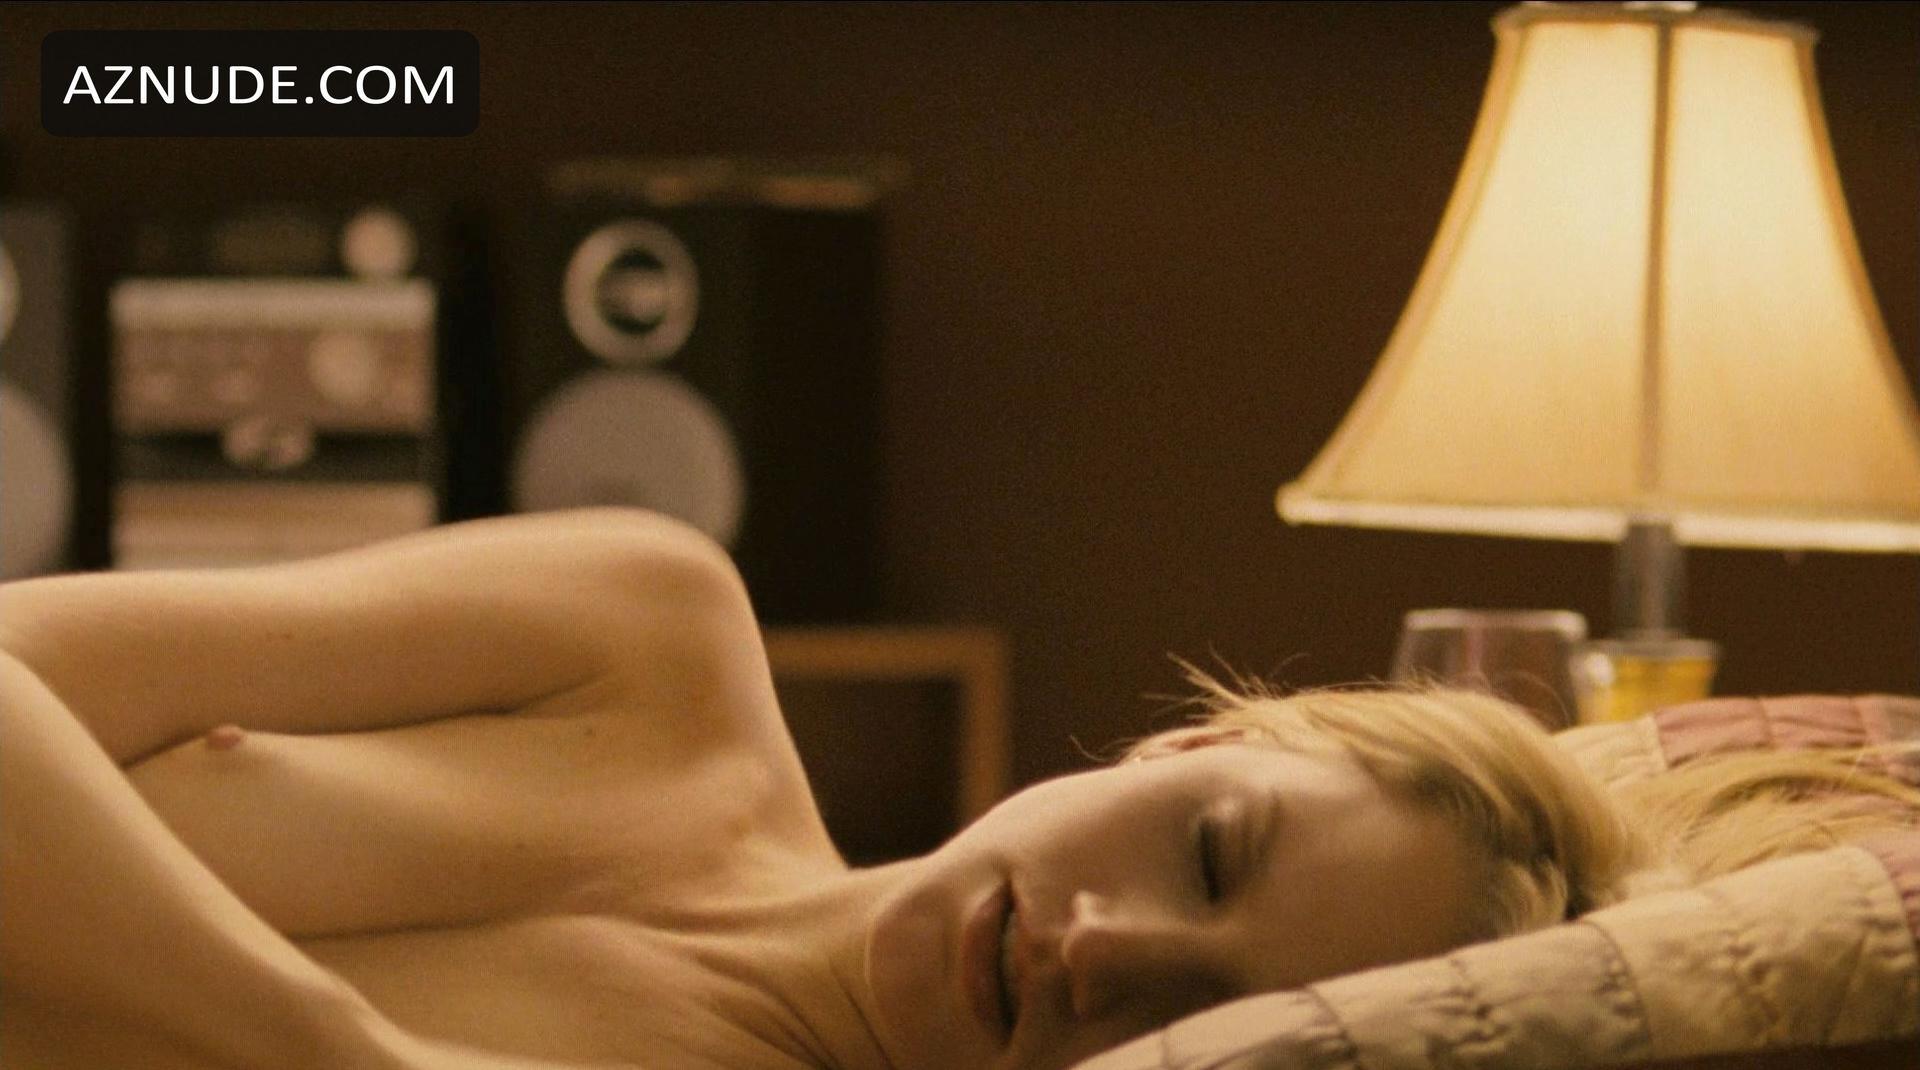 Young People Fucking Nude Scenes - Aznude-8410